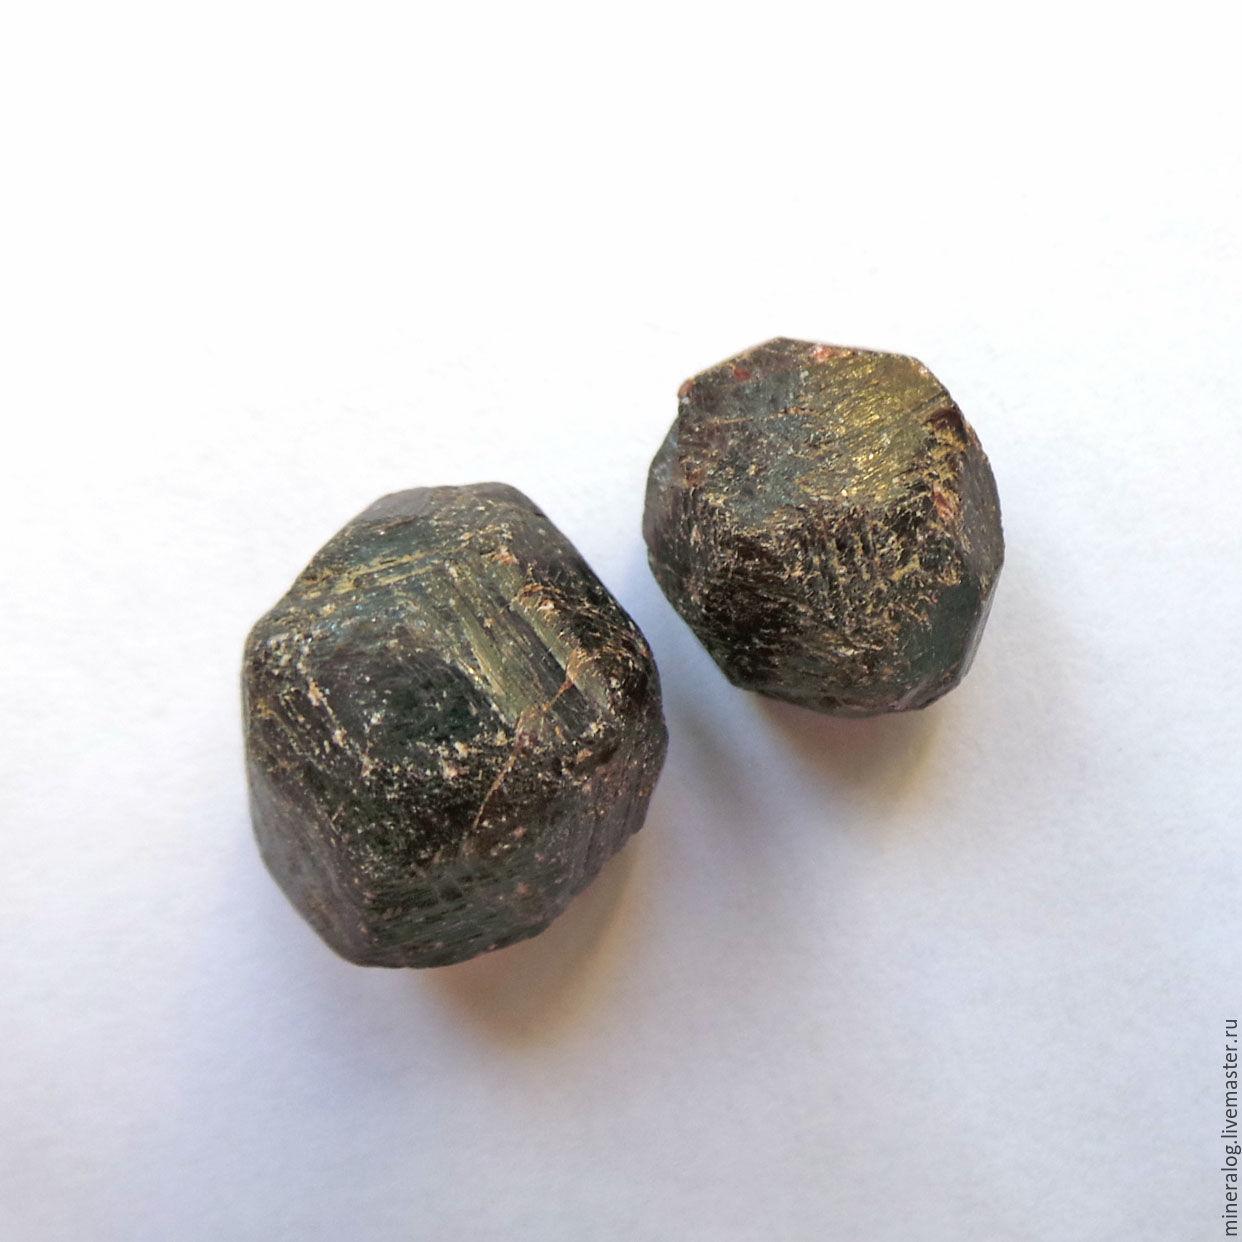 Гранат Альмандин, пара кристаллов, Минералы, Москва,  Фото №1